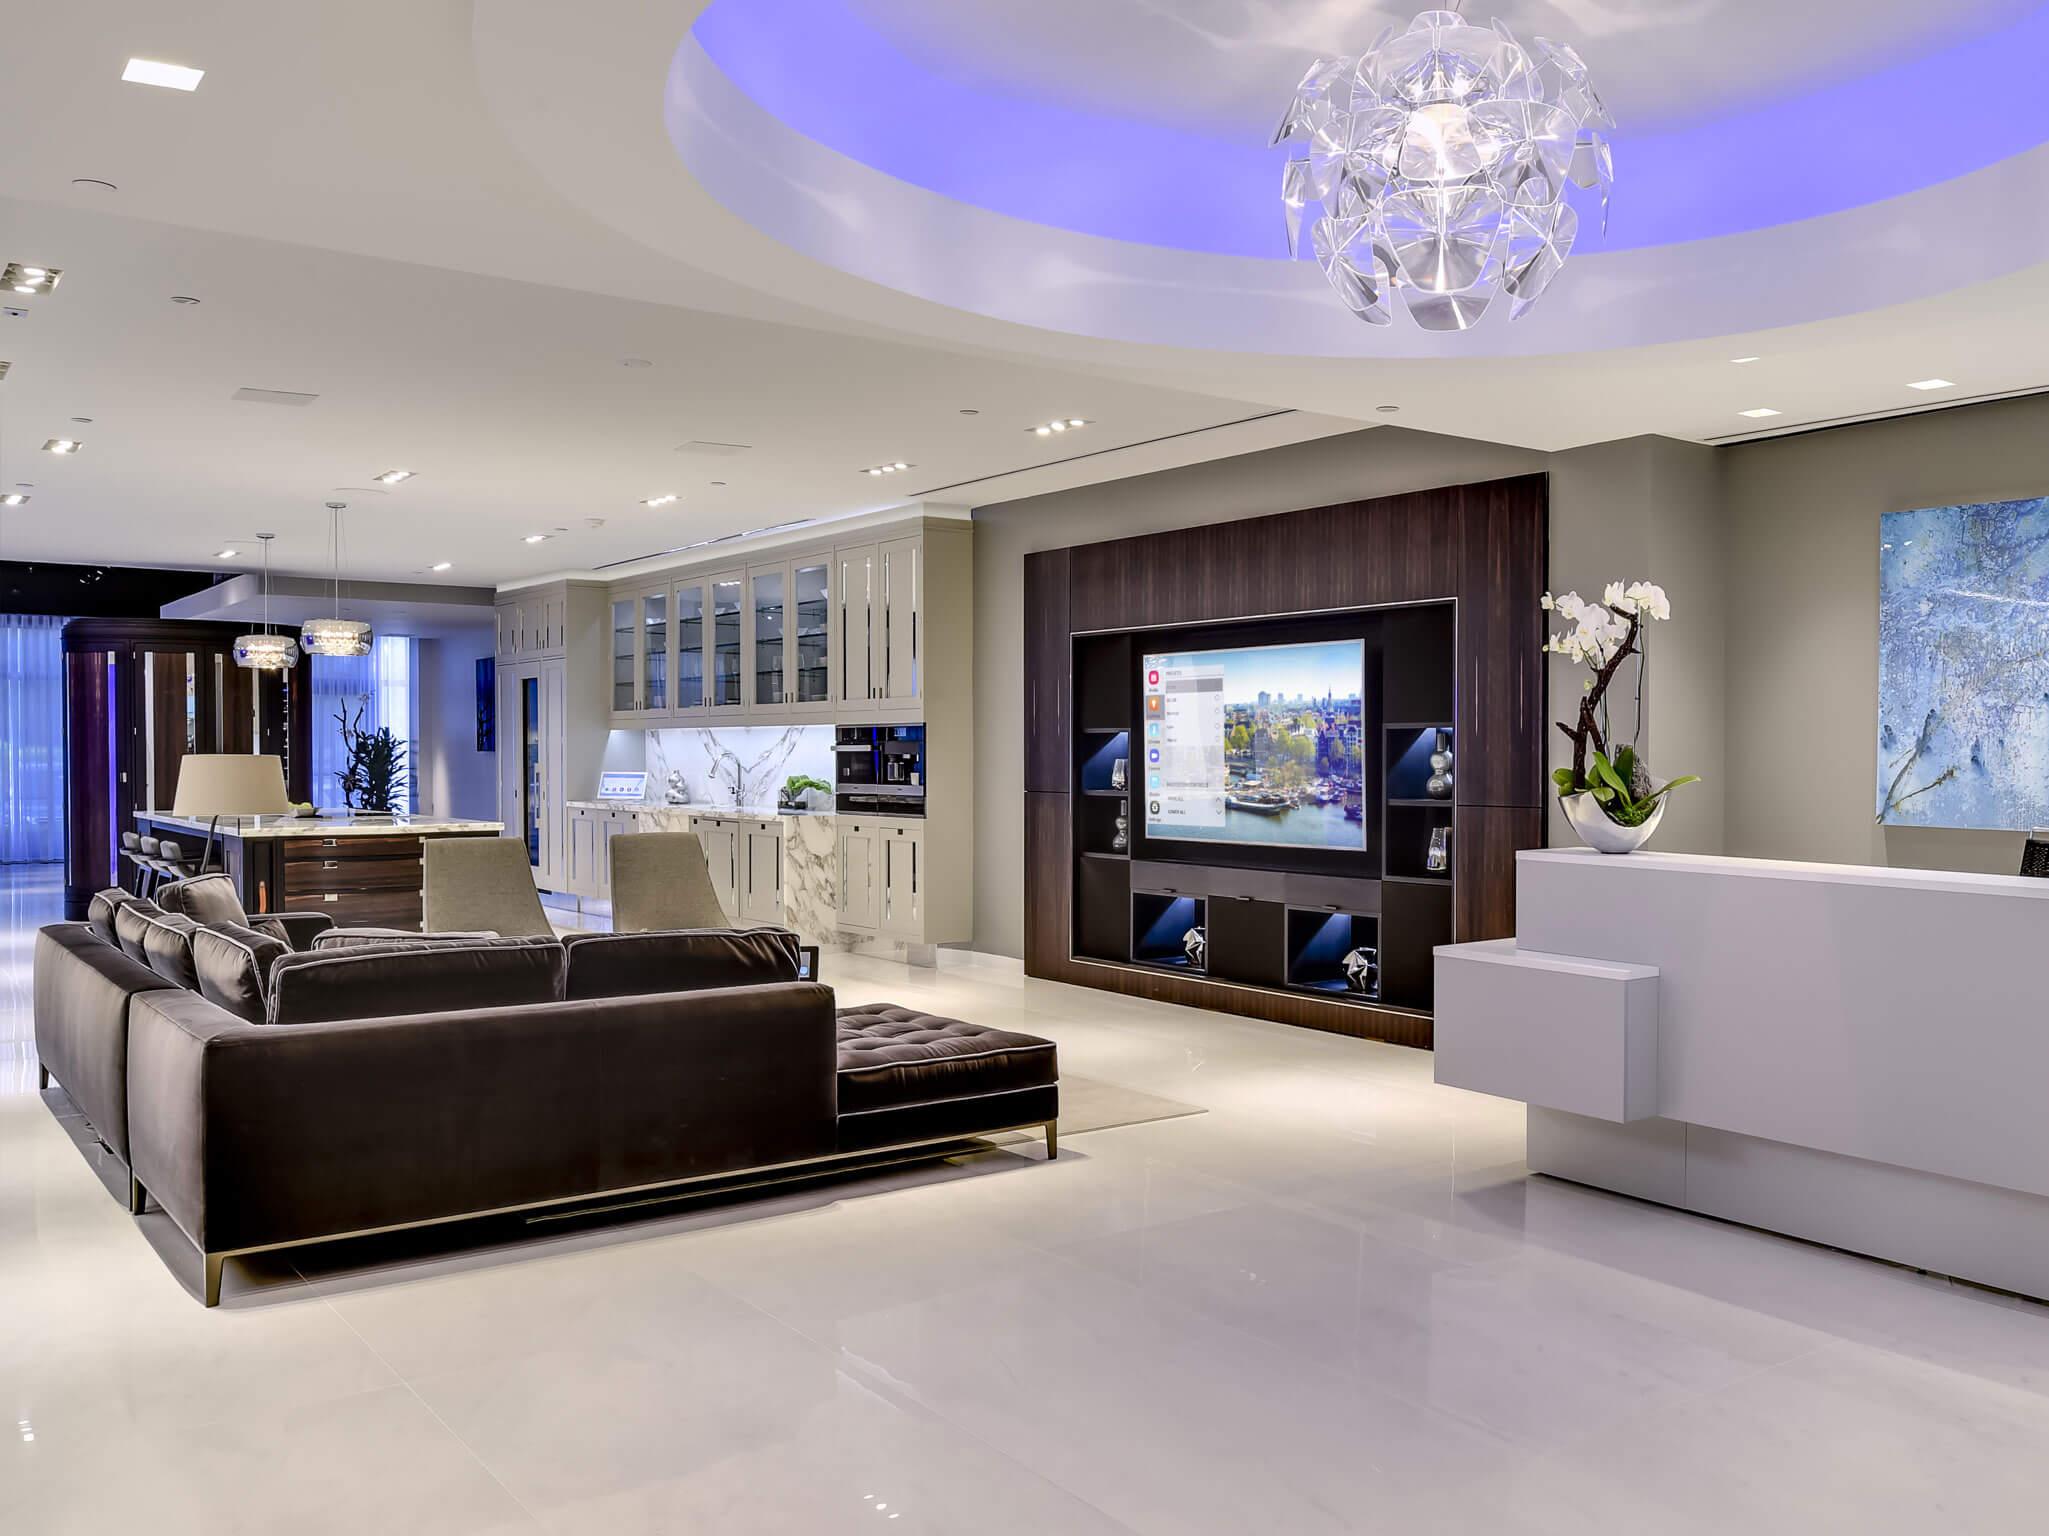 MDfx-Within-Bespoke -Home-Cinema-Design